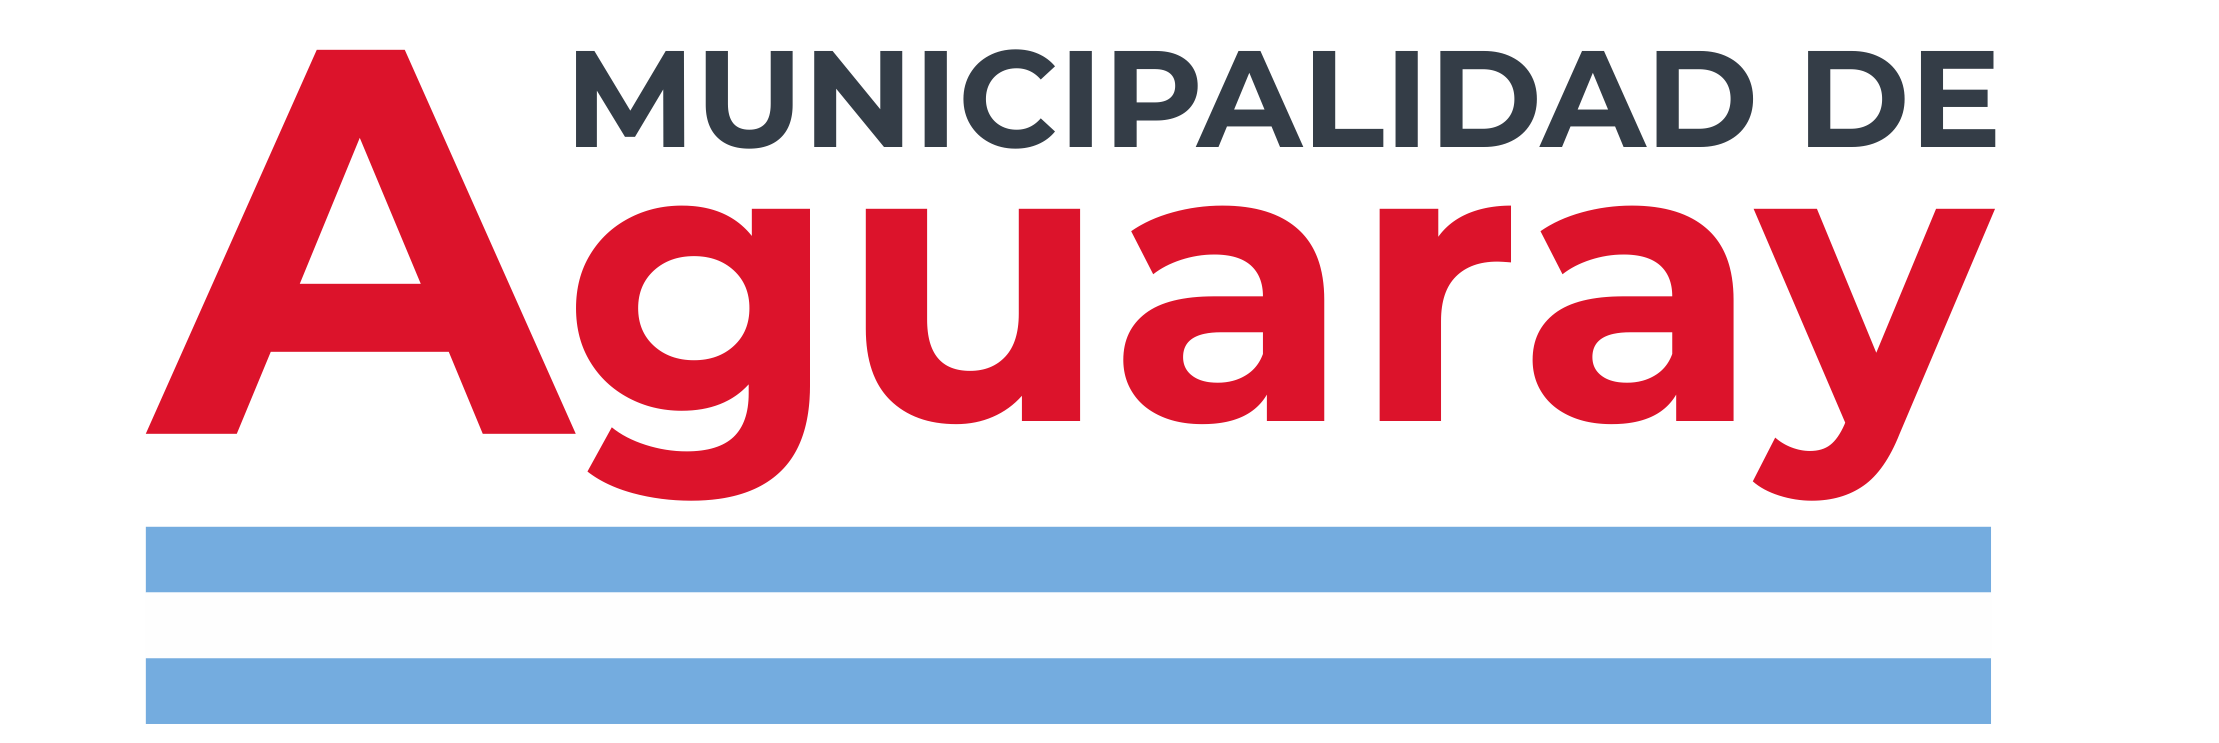 Municipalidad de Aguaray